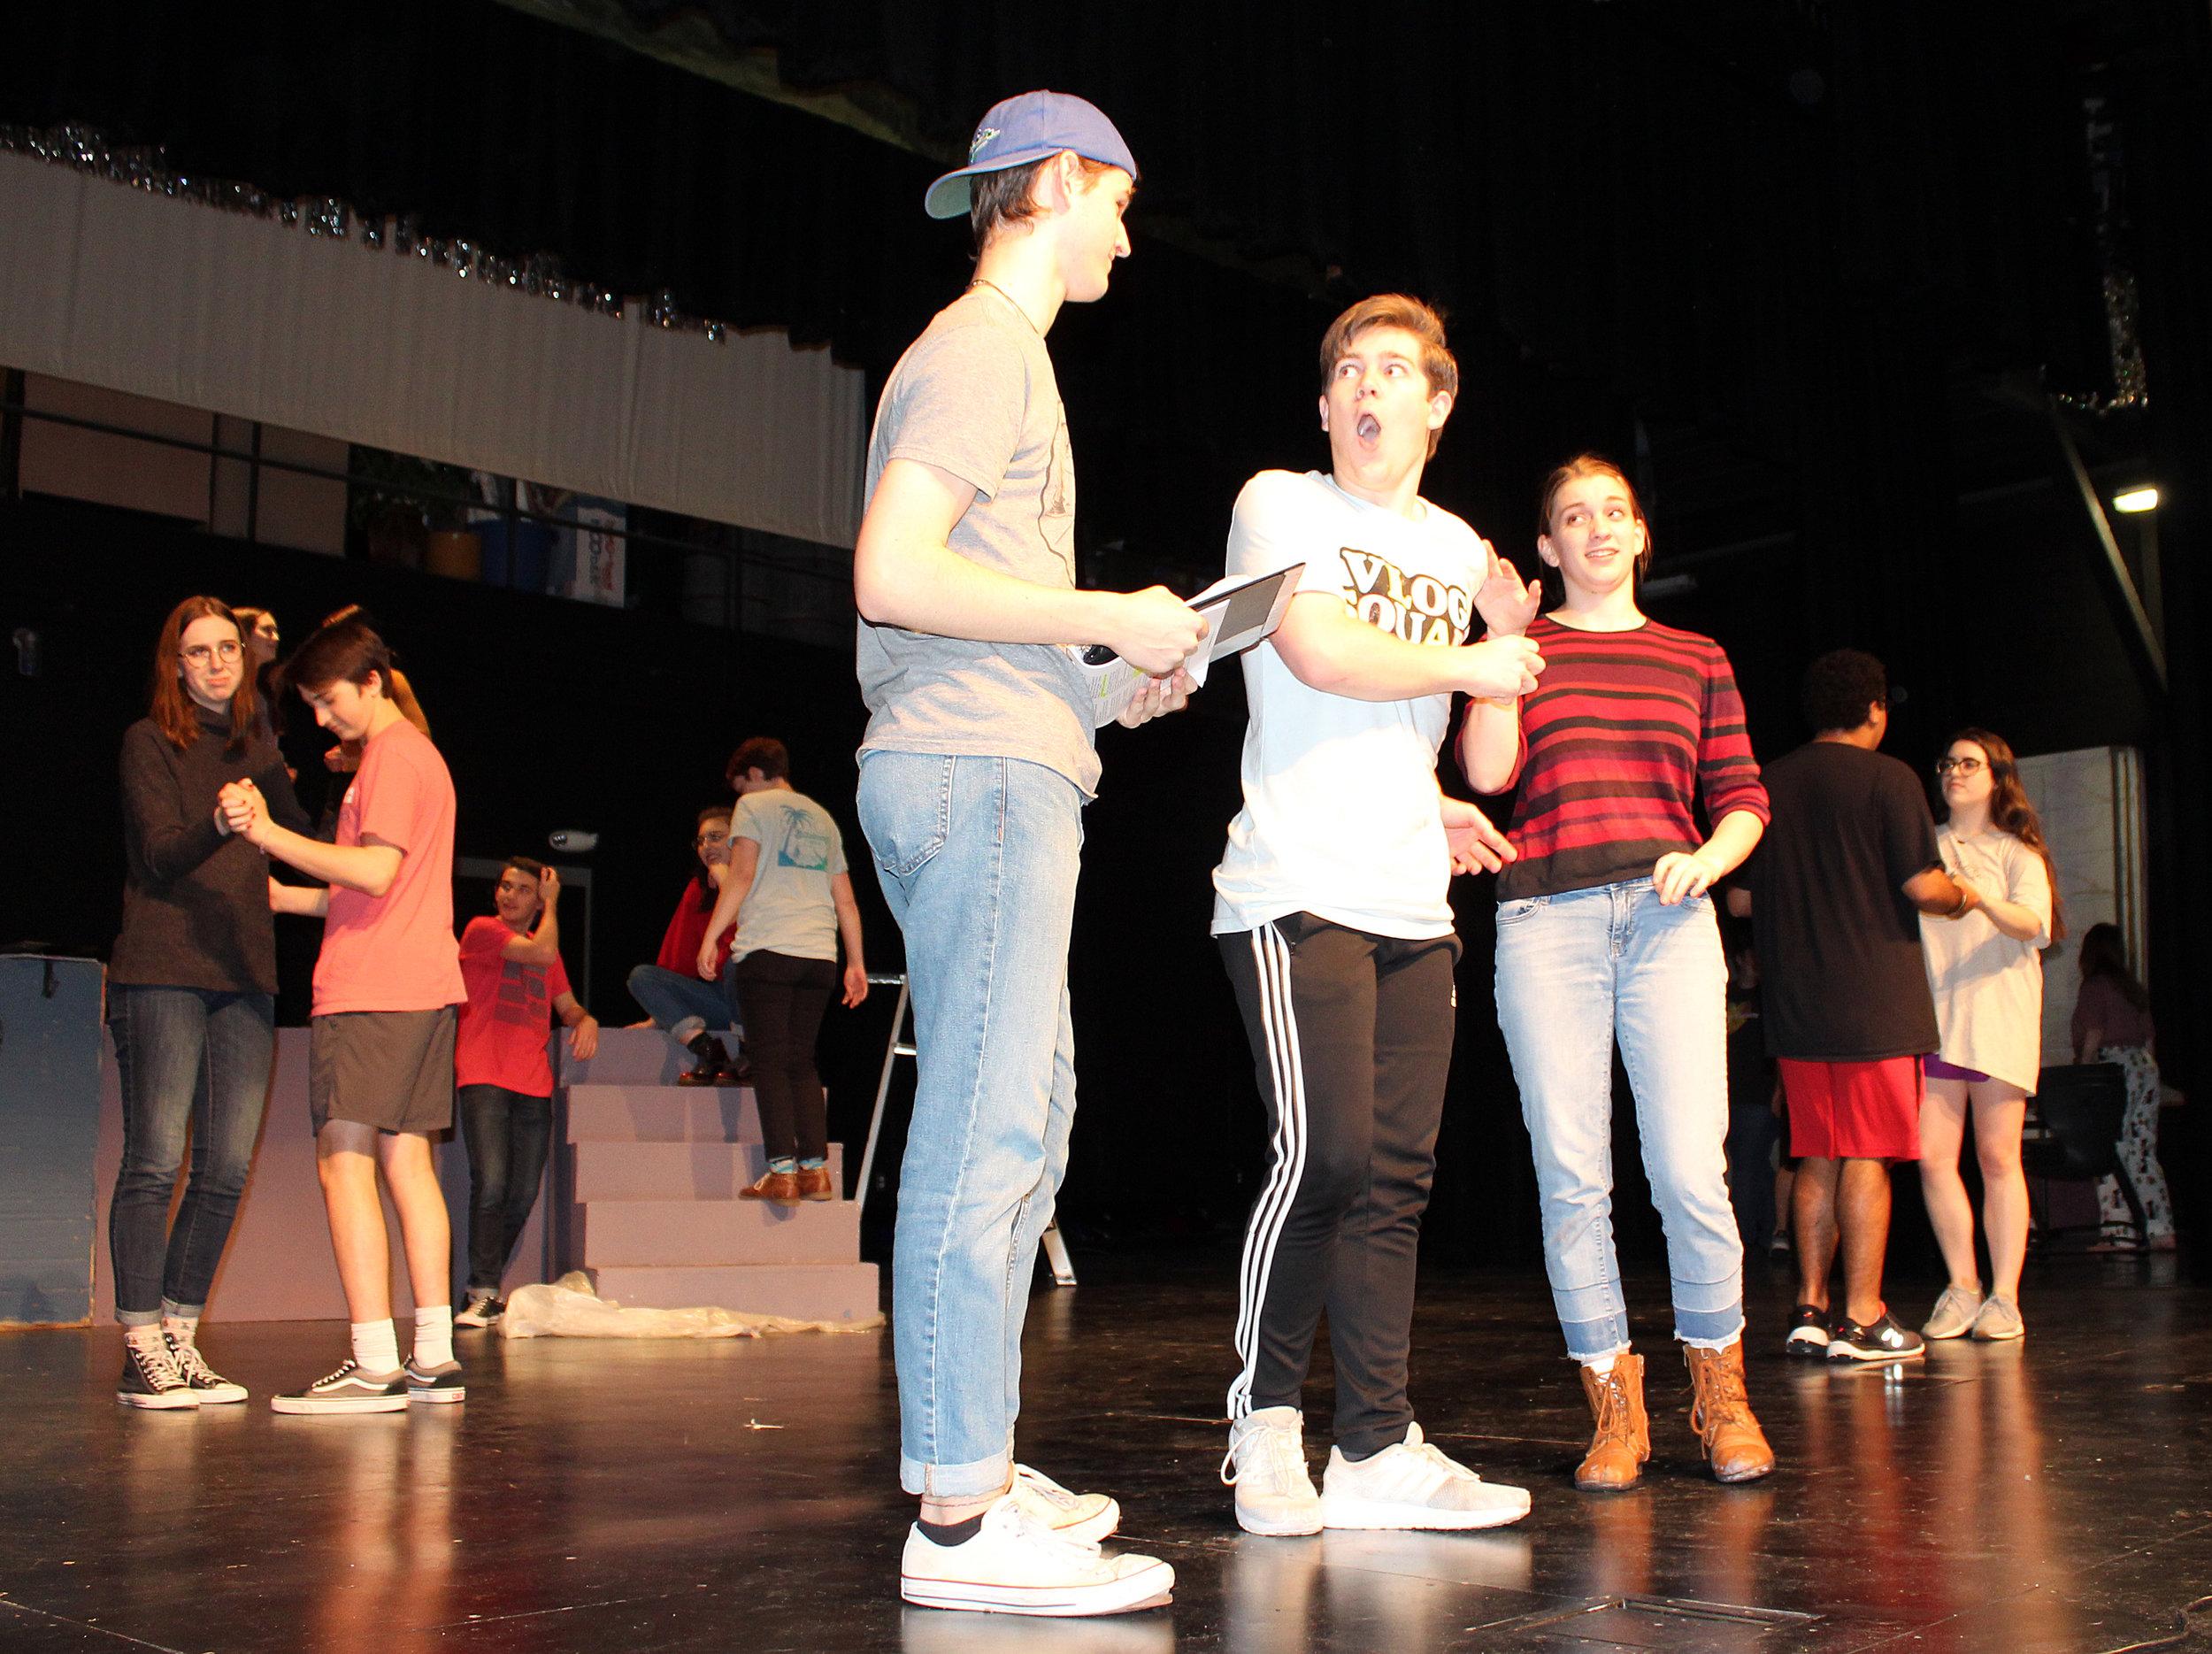 Bryce Fuller (Danny), Alec Welhouse (Eugene), and Marcie Sawyers (Patty).